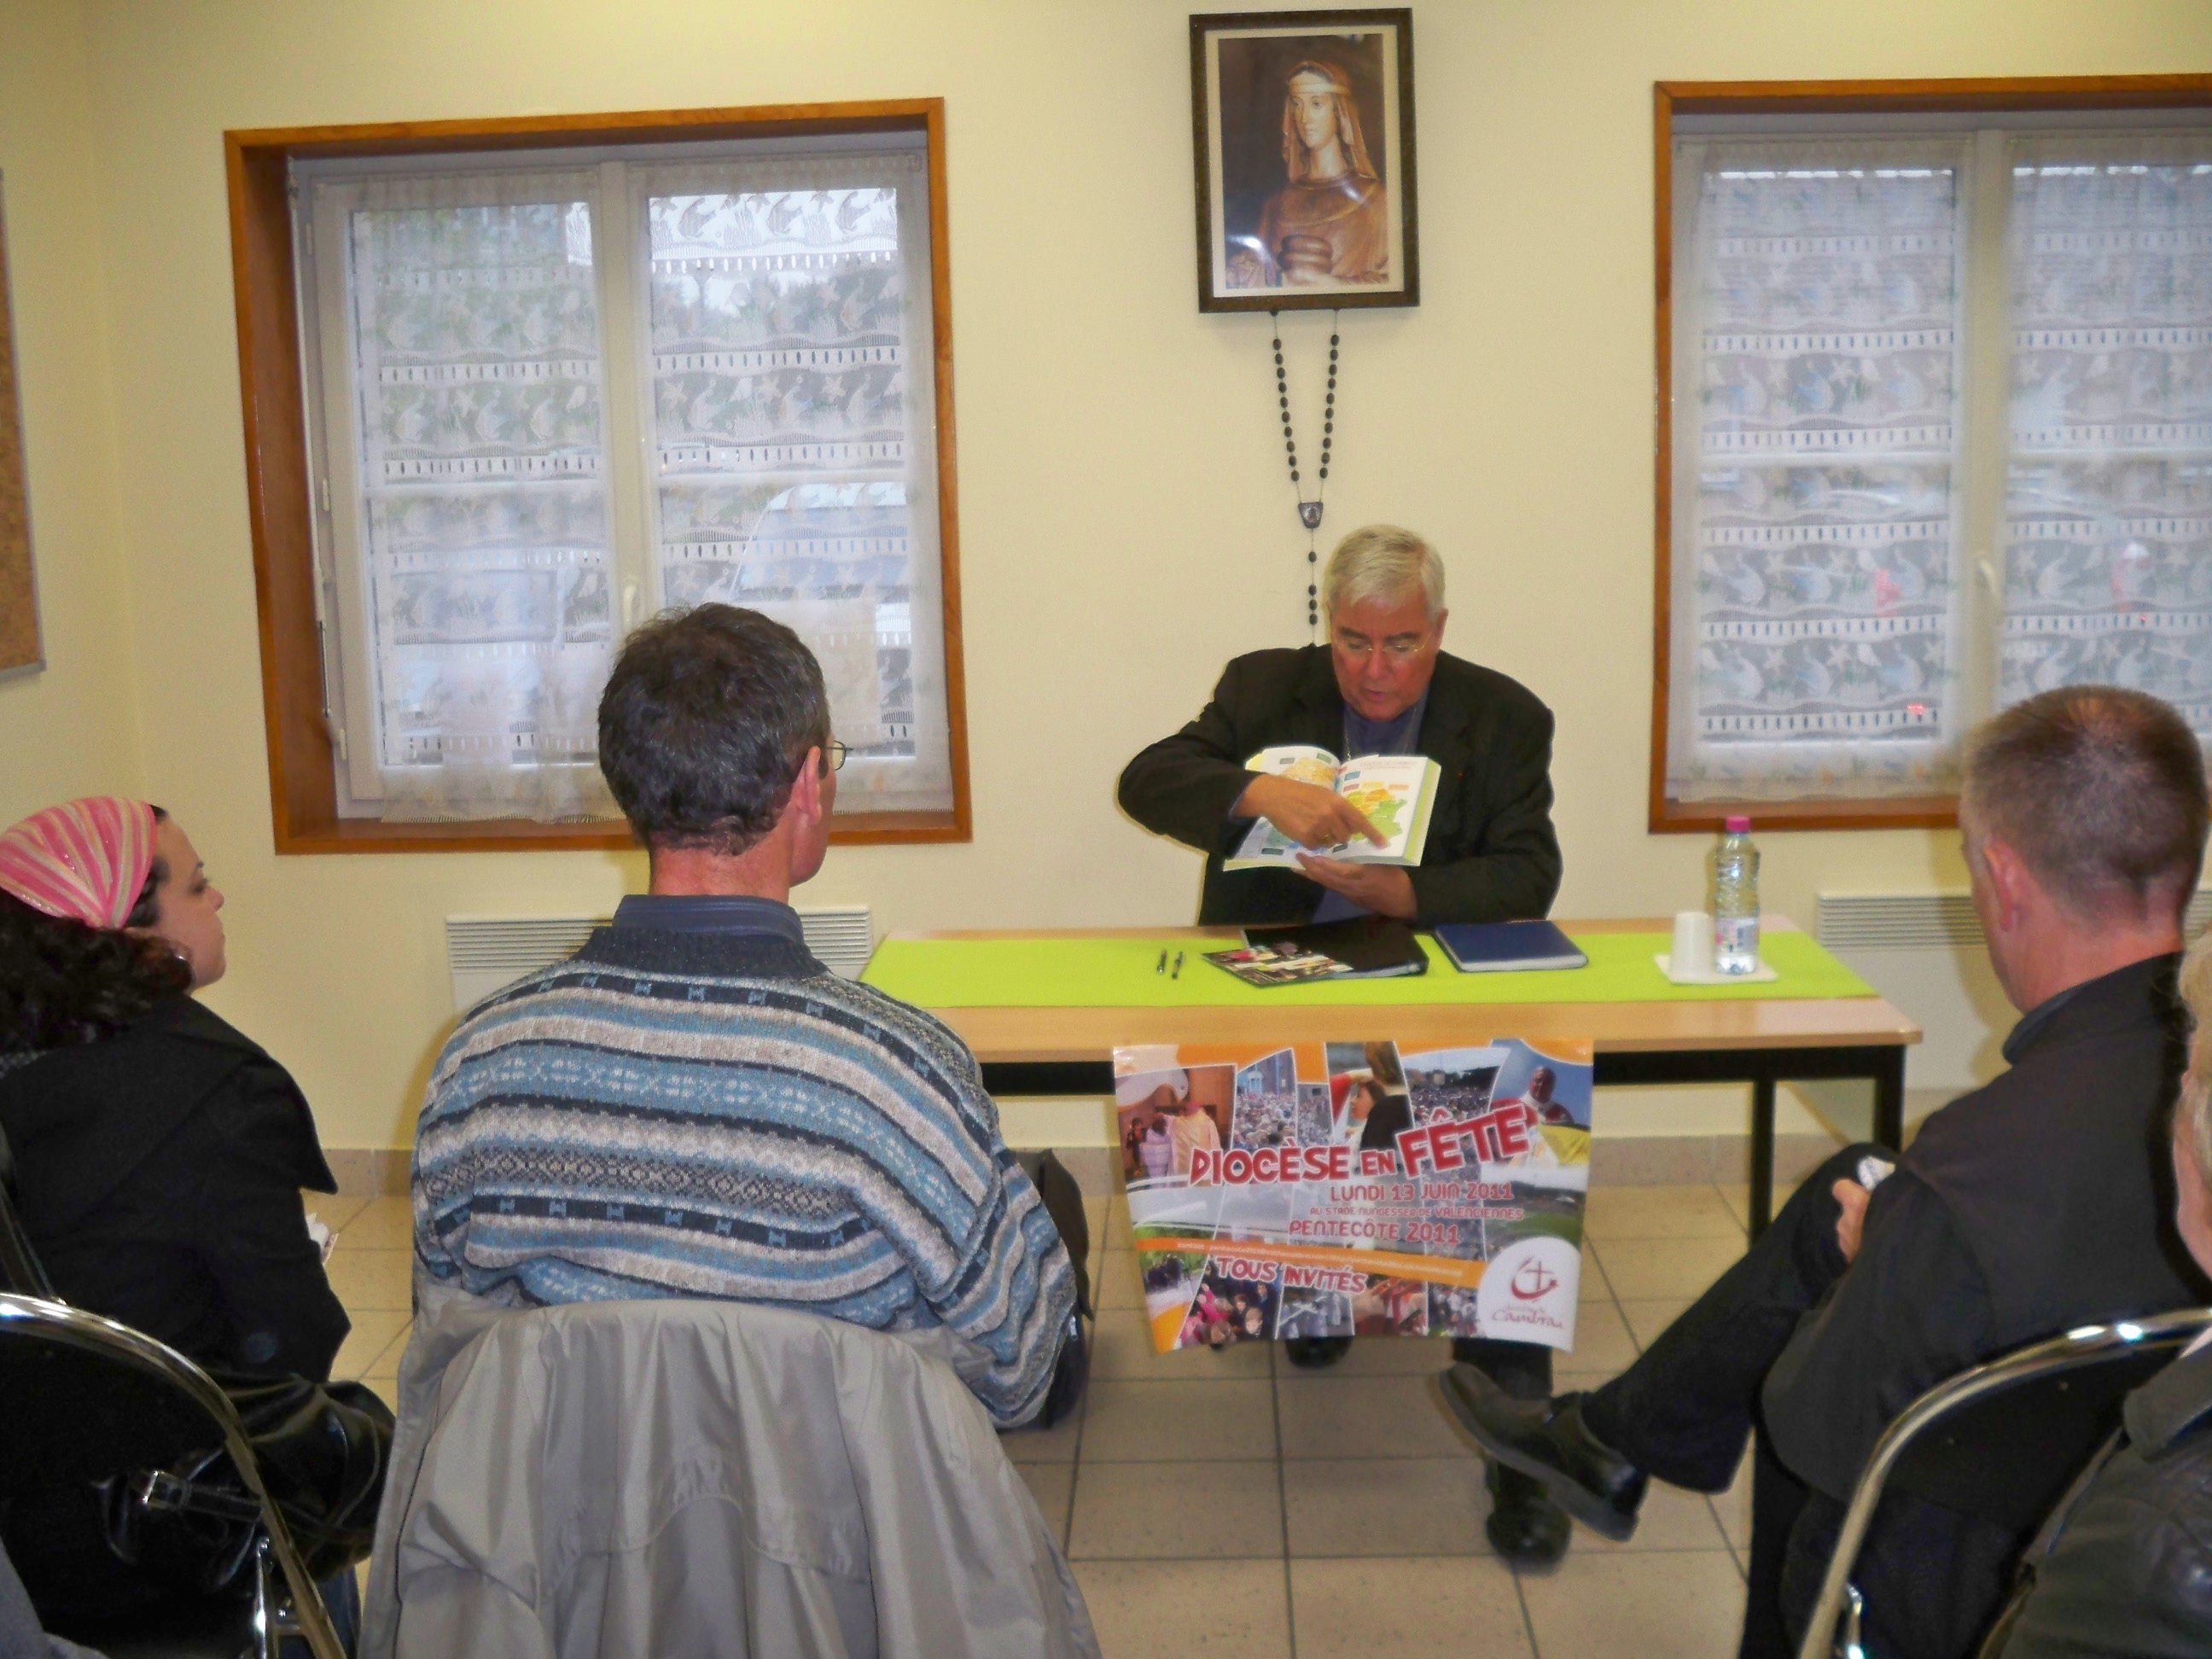 visite pastorale 1er jour 007